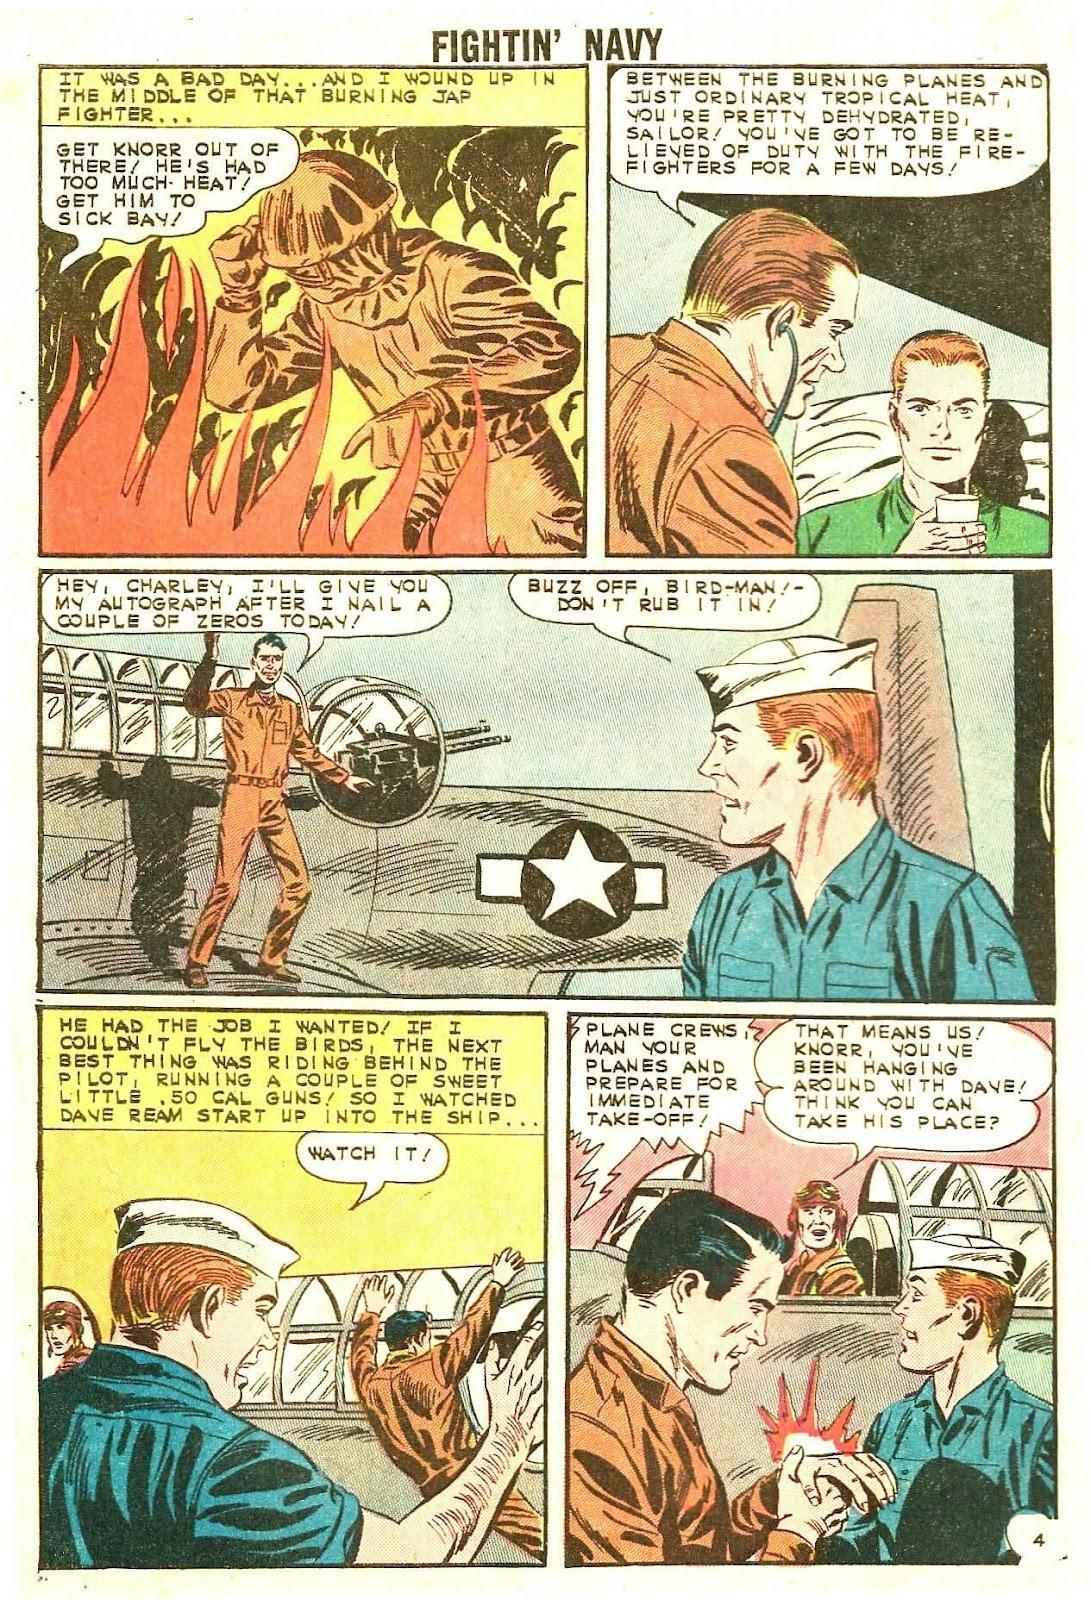 Read online Fightin' Navy comic -  Issue #114 - 28